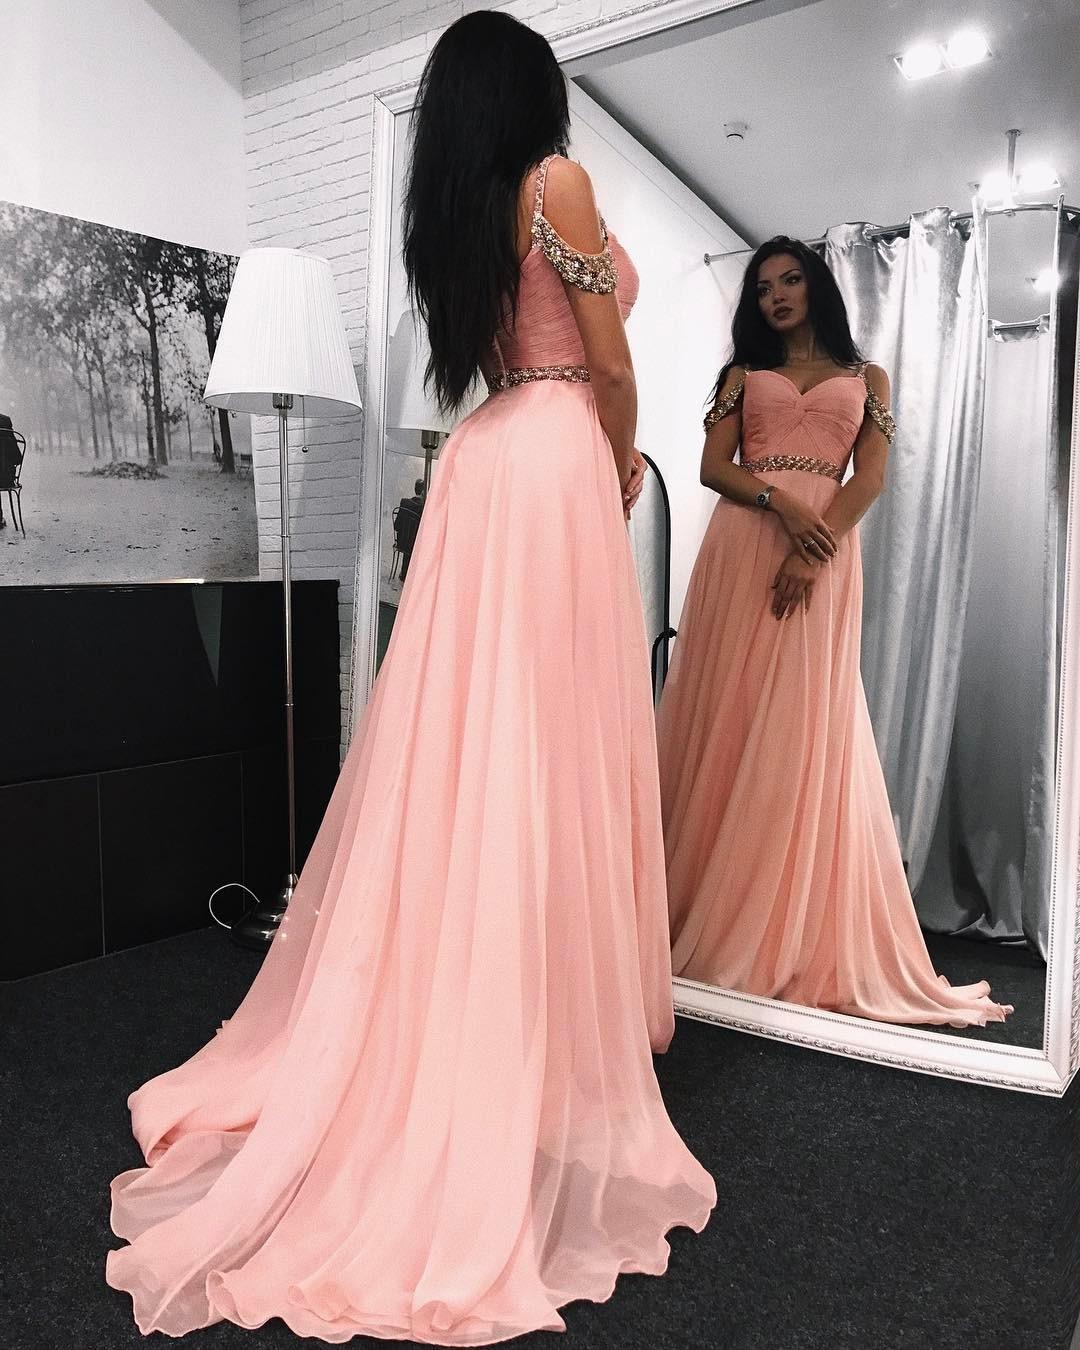 Formal Schön Abendkleider Lang Pink Spezialgebiet20 Genial Abendkleider Lang Pink Bester Preis